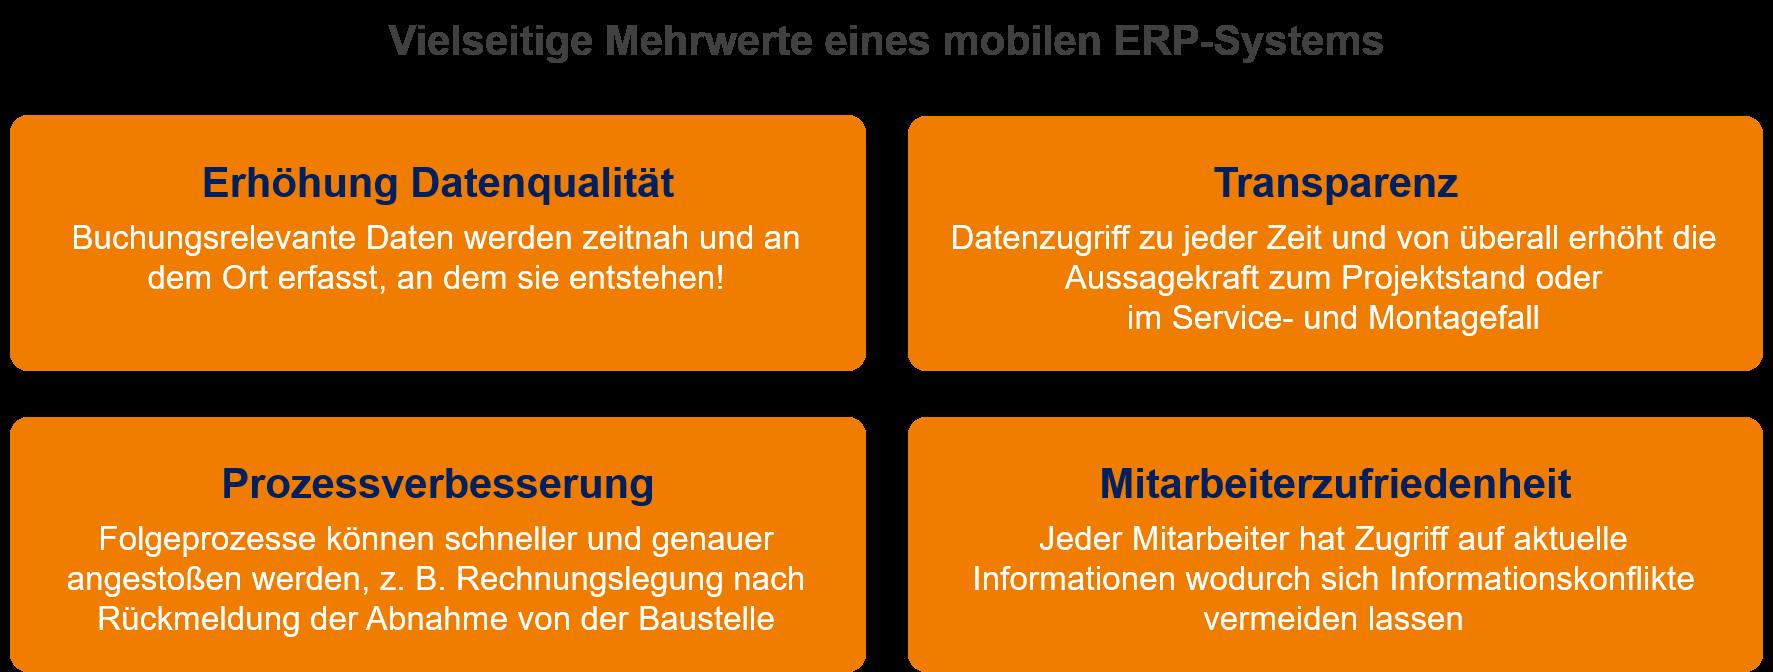 Mehrwerte-Mobiles-ERP-System